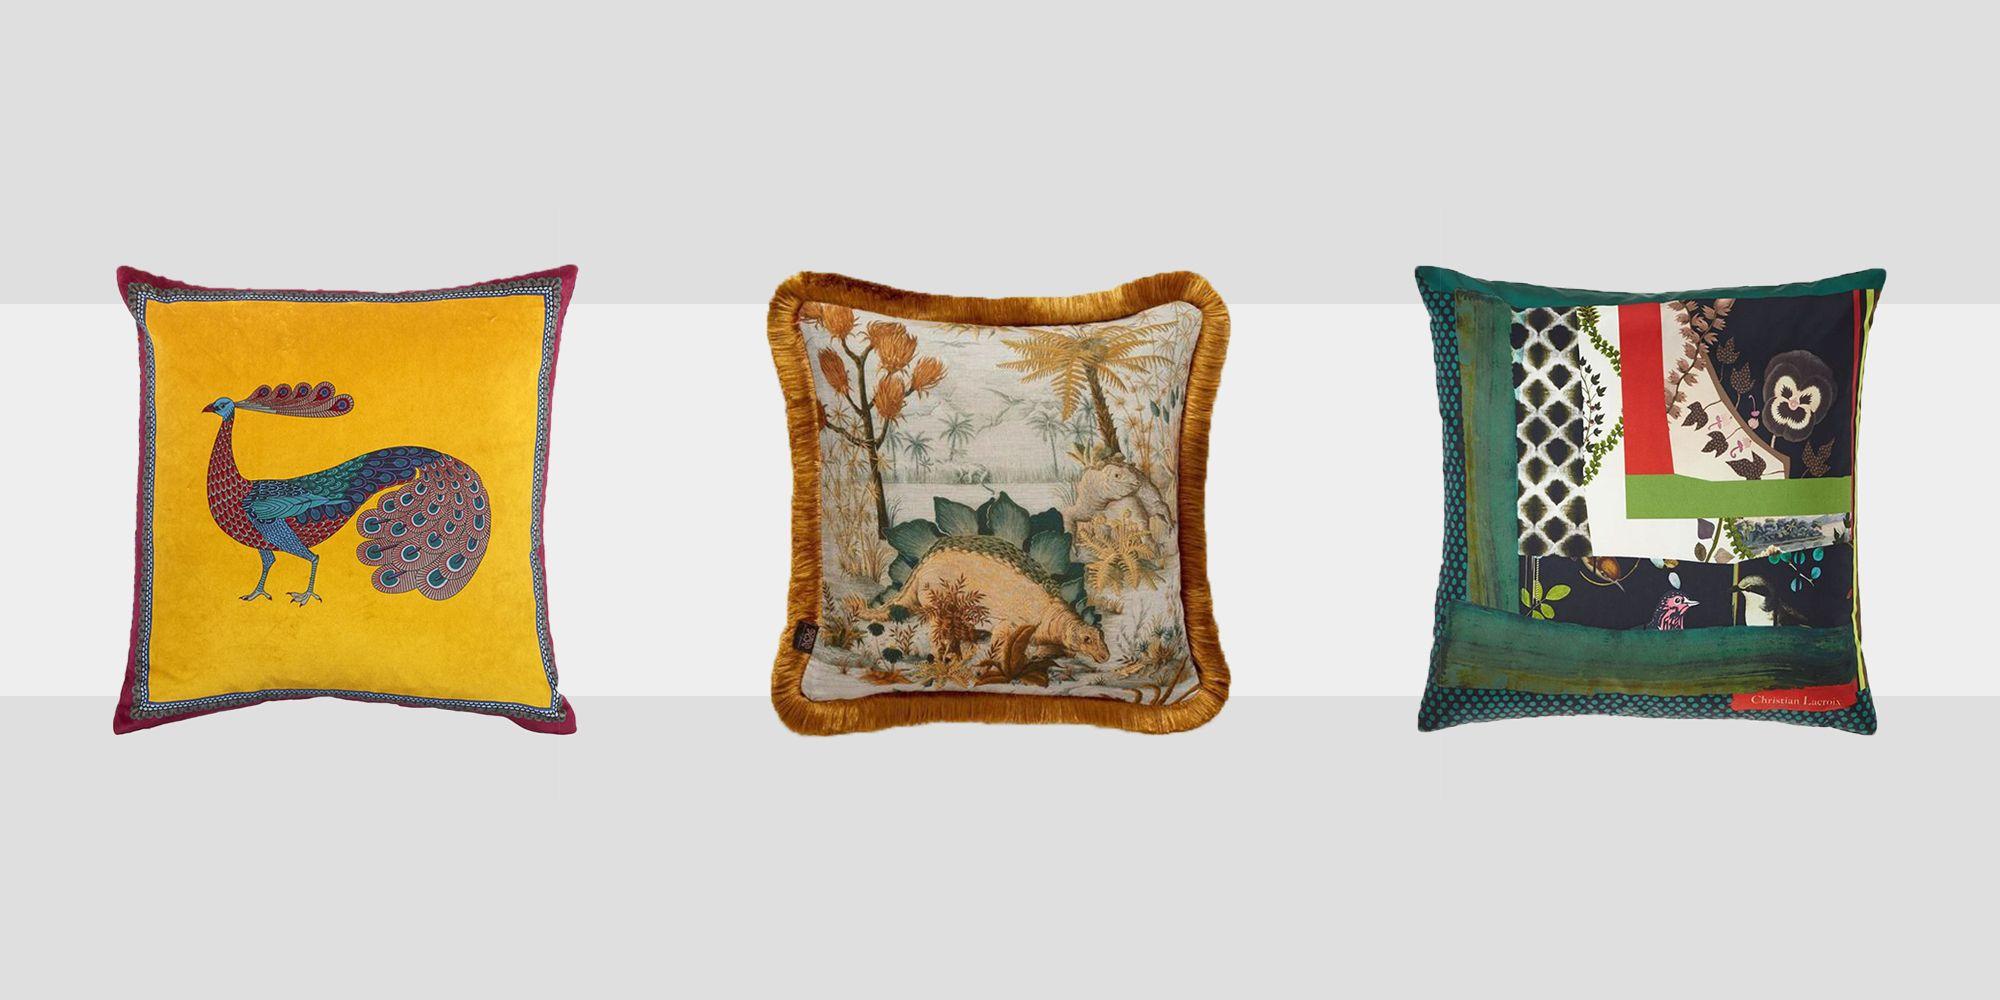 13 Best Throw Pillows 2021 Most Stylish Decorative Throw Pillows